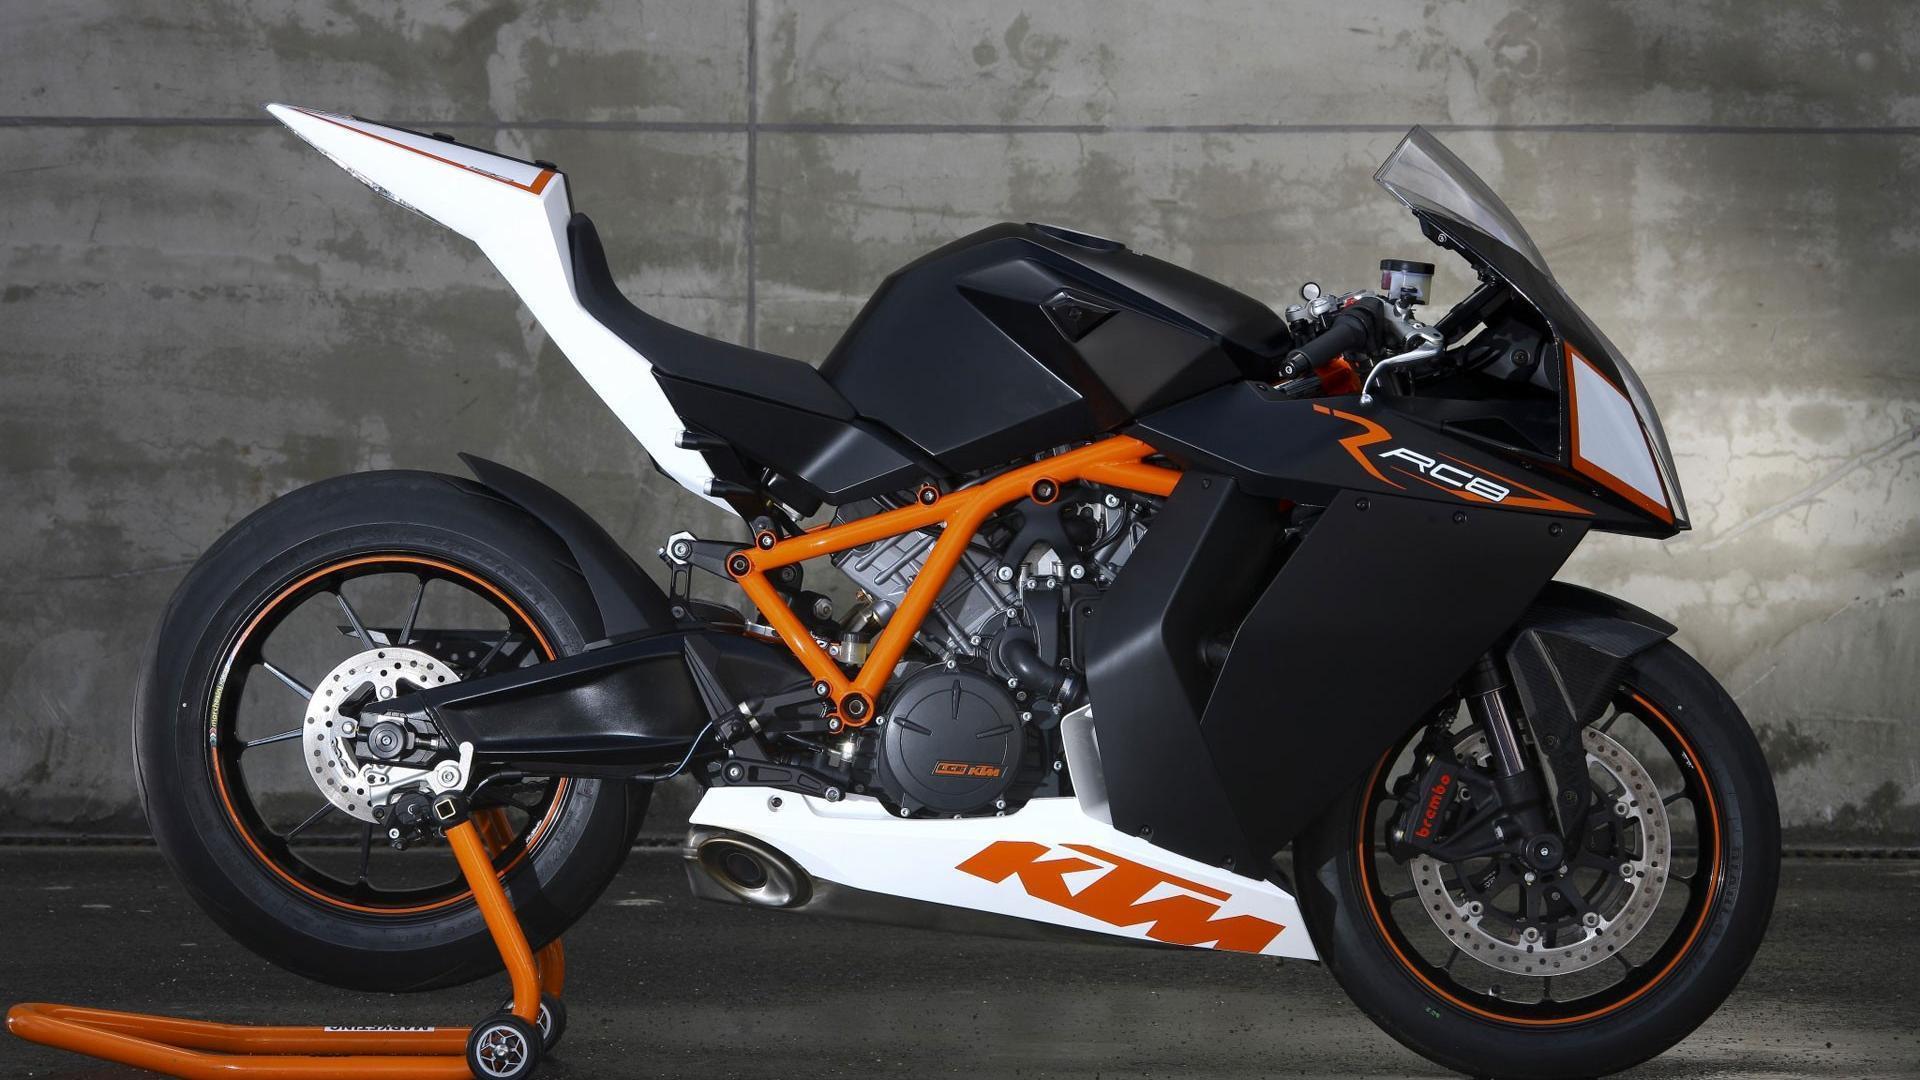 ktm motorcycles HD wallpaper #2337822